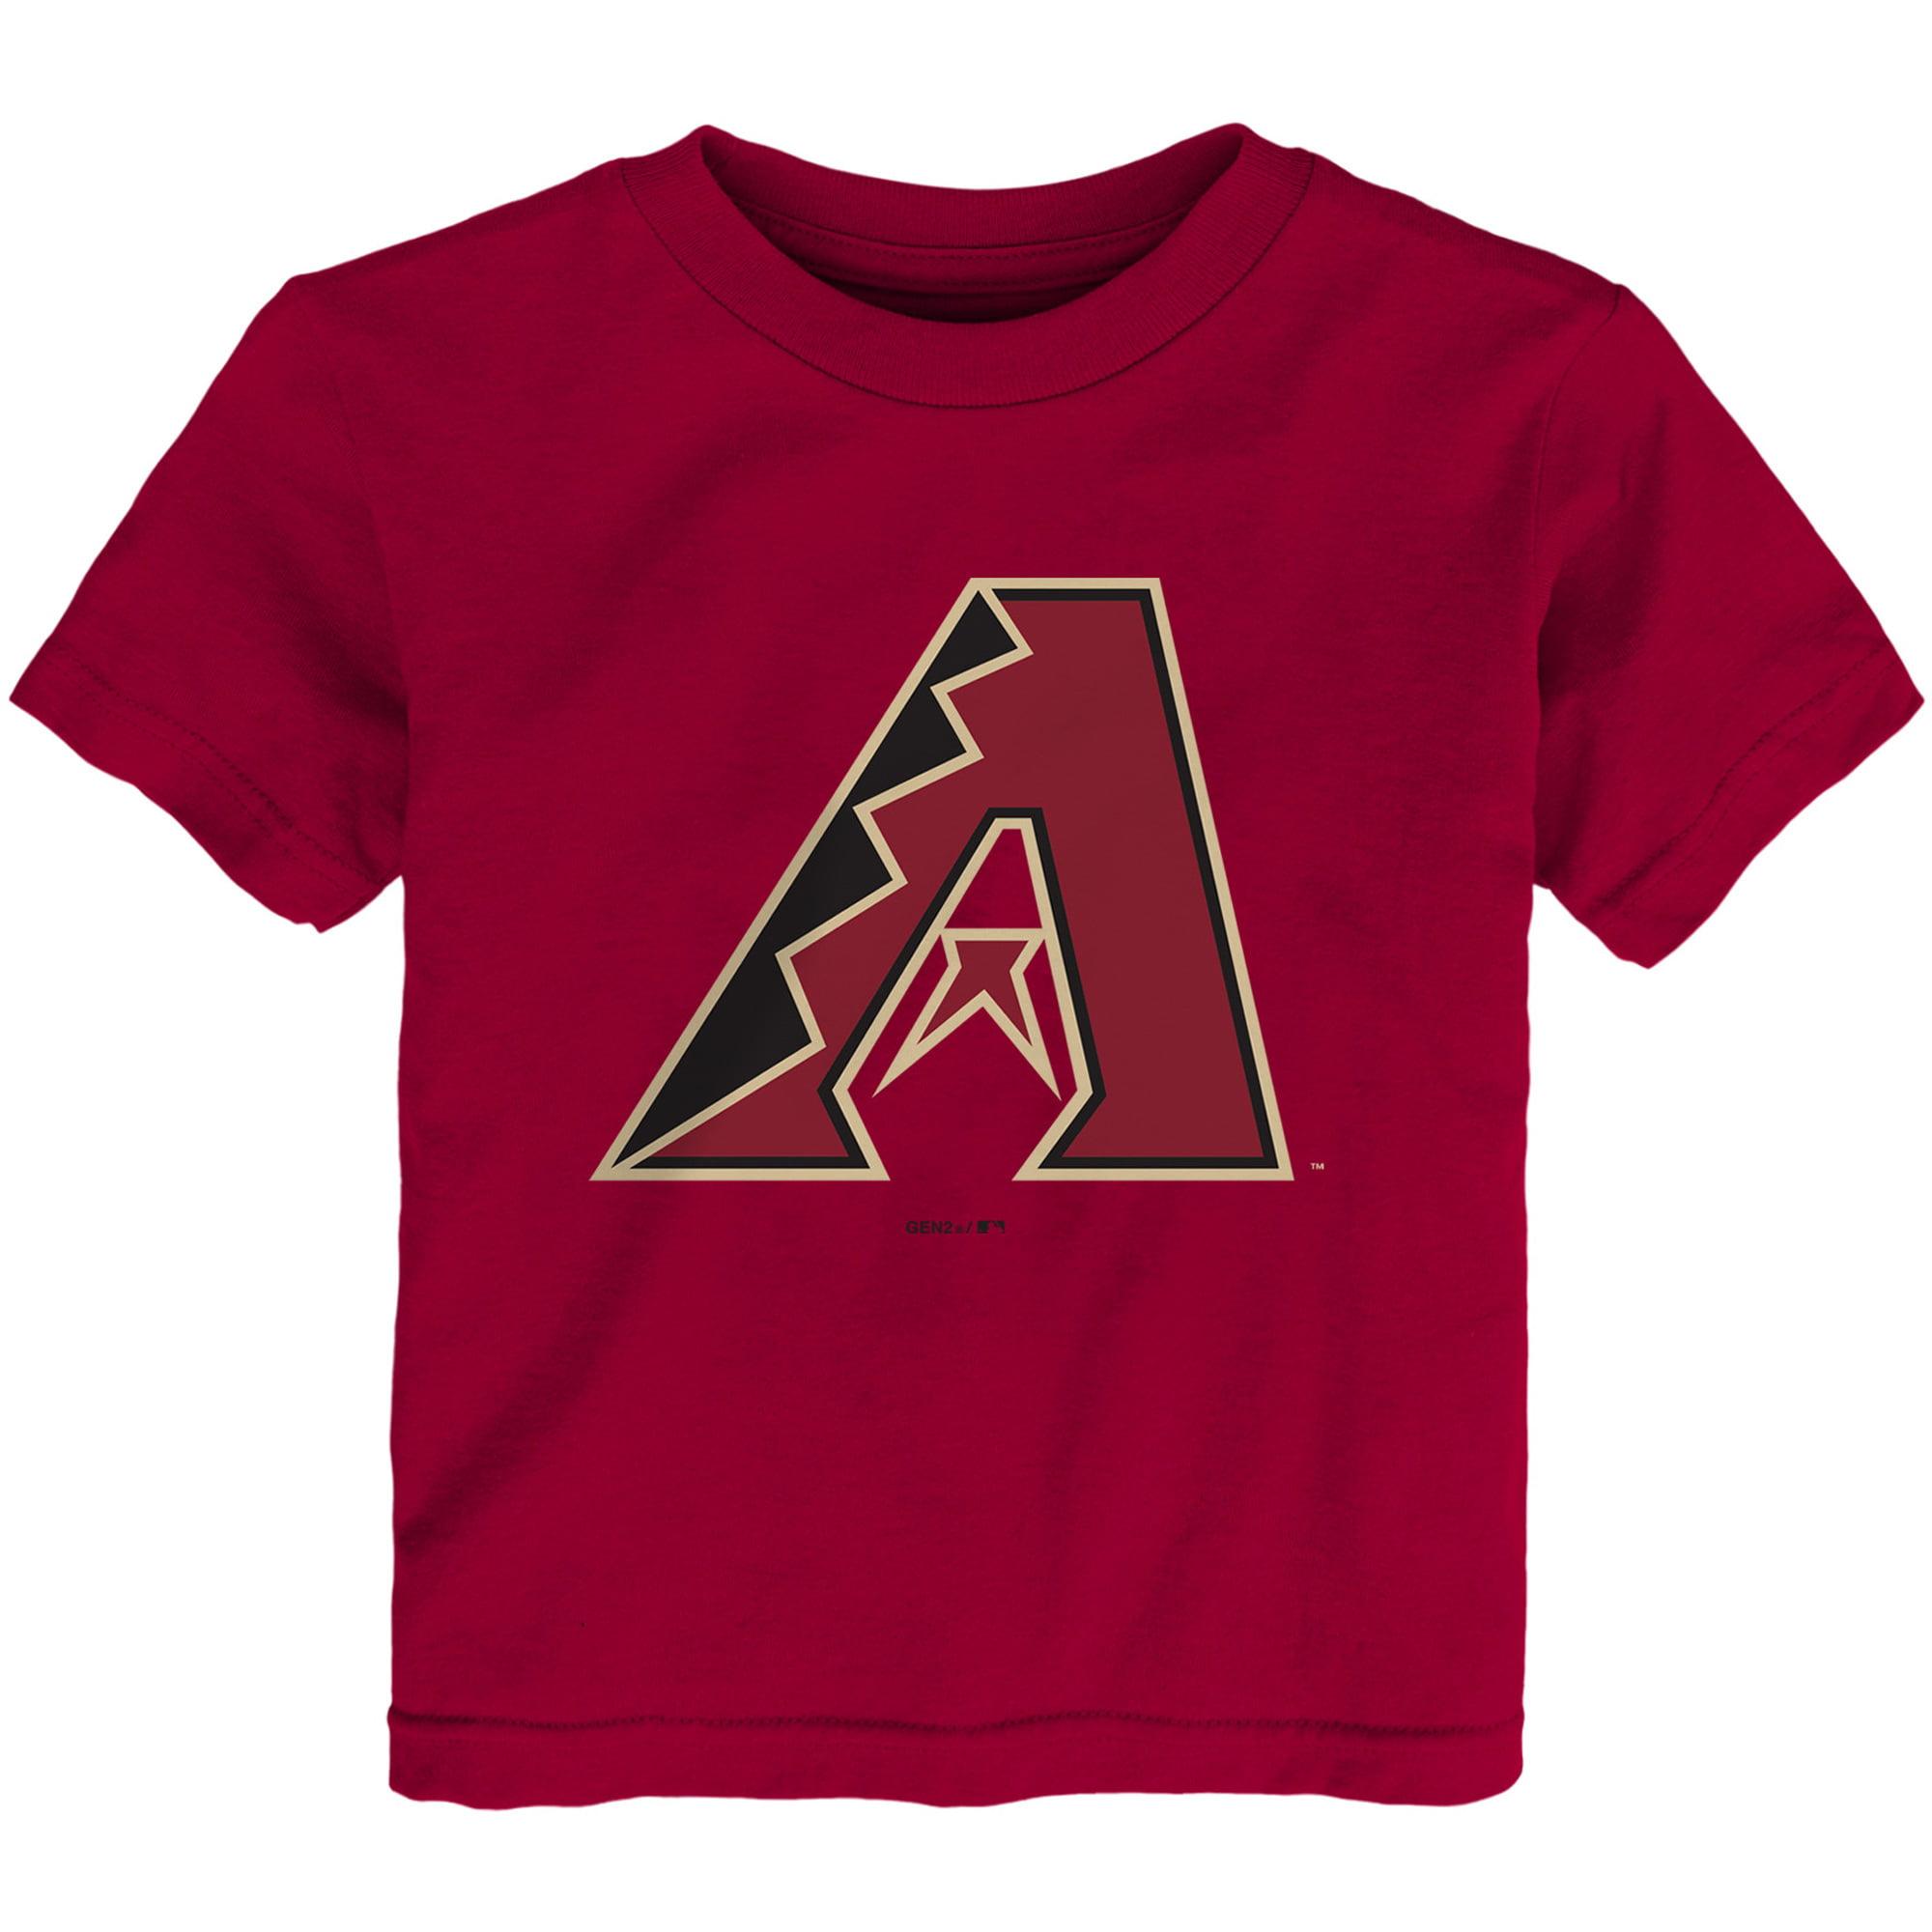 Arizona Diamondbacks Toddler Team Primary Logo T-Shirt - Red